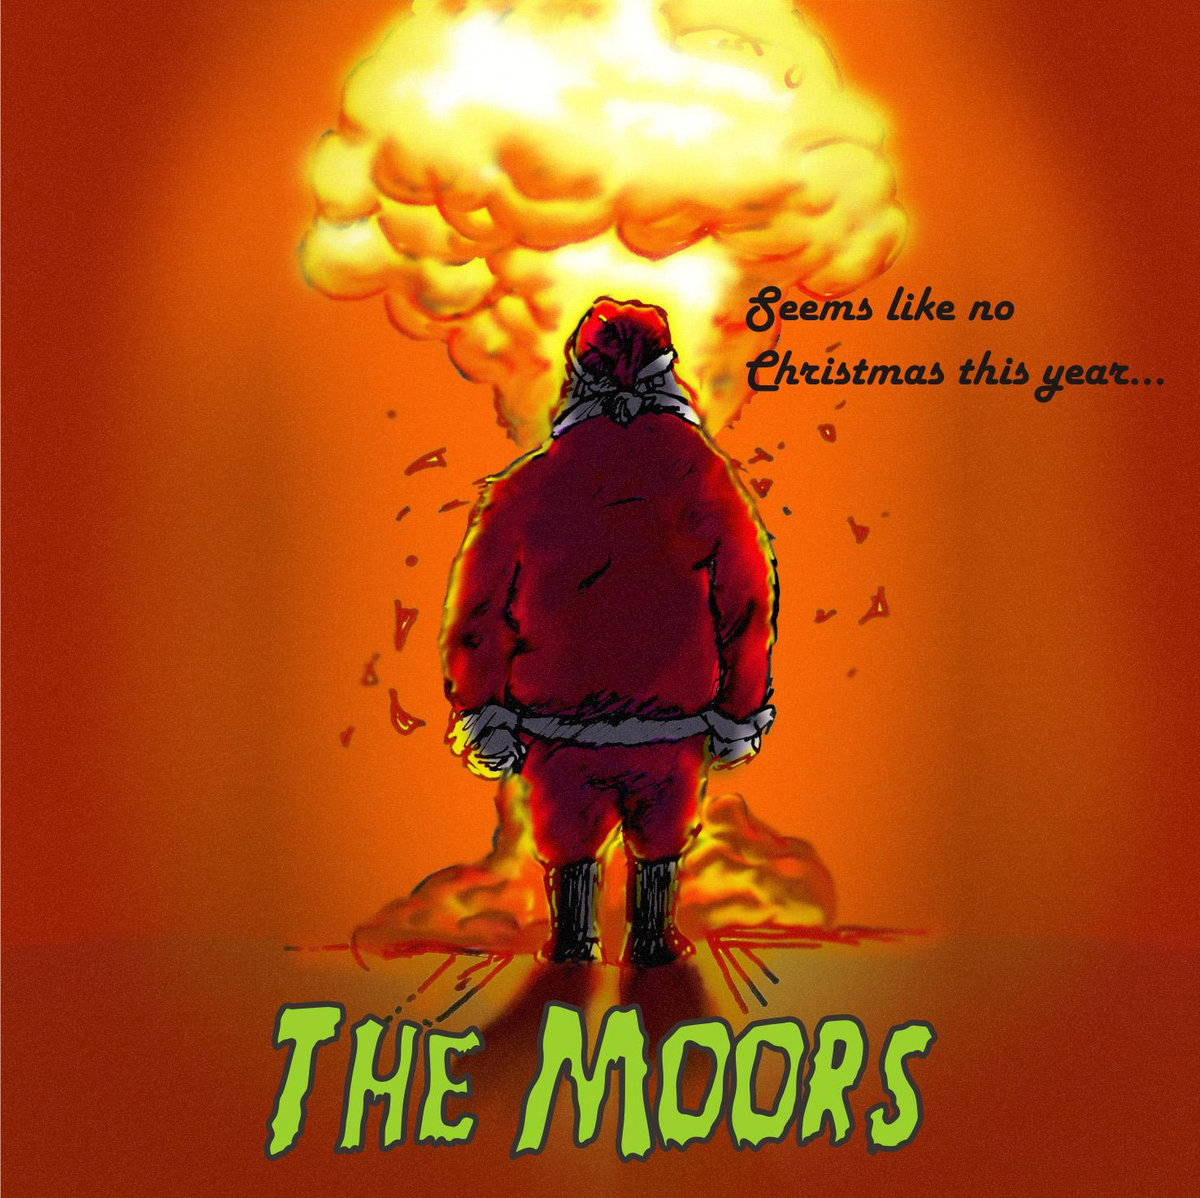 Seems like no Christmas this year | THE MOORS